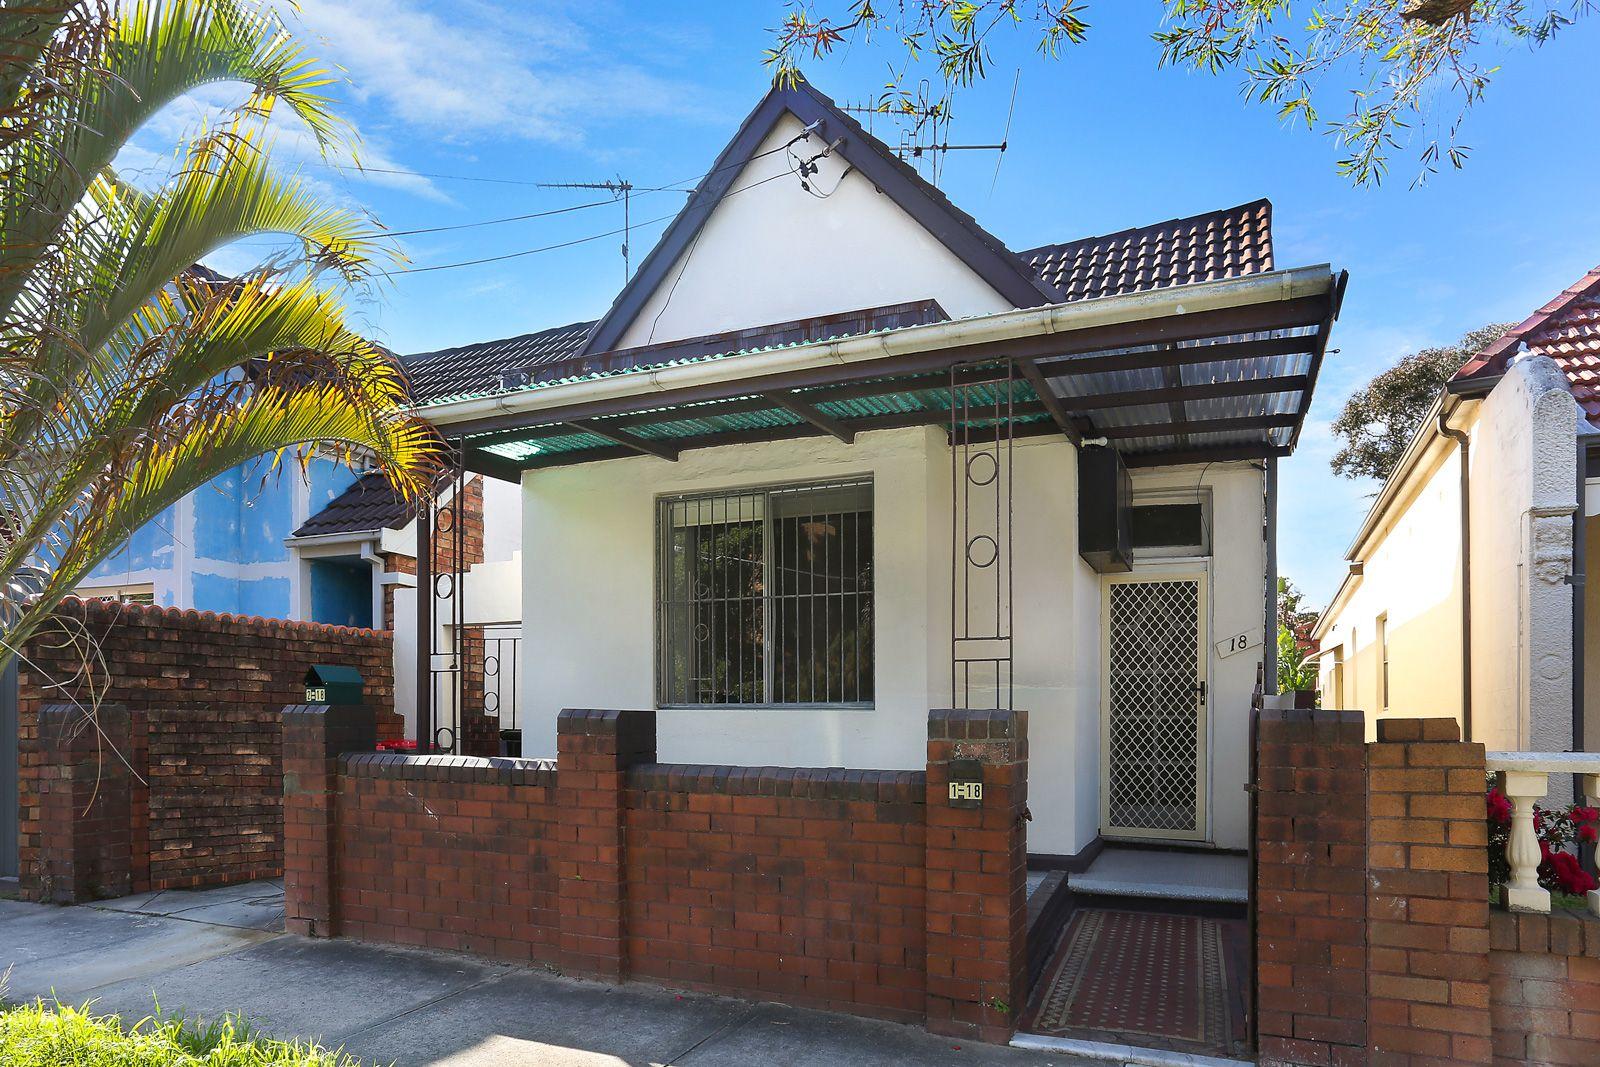 2/18 Elsmere Street, Kensington NSW 2033, Image 0